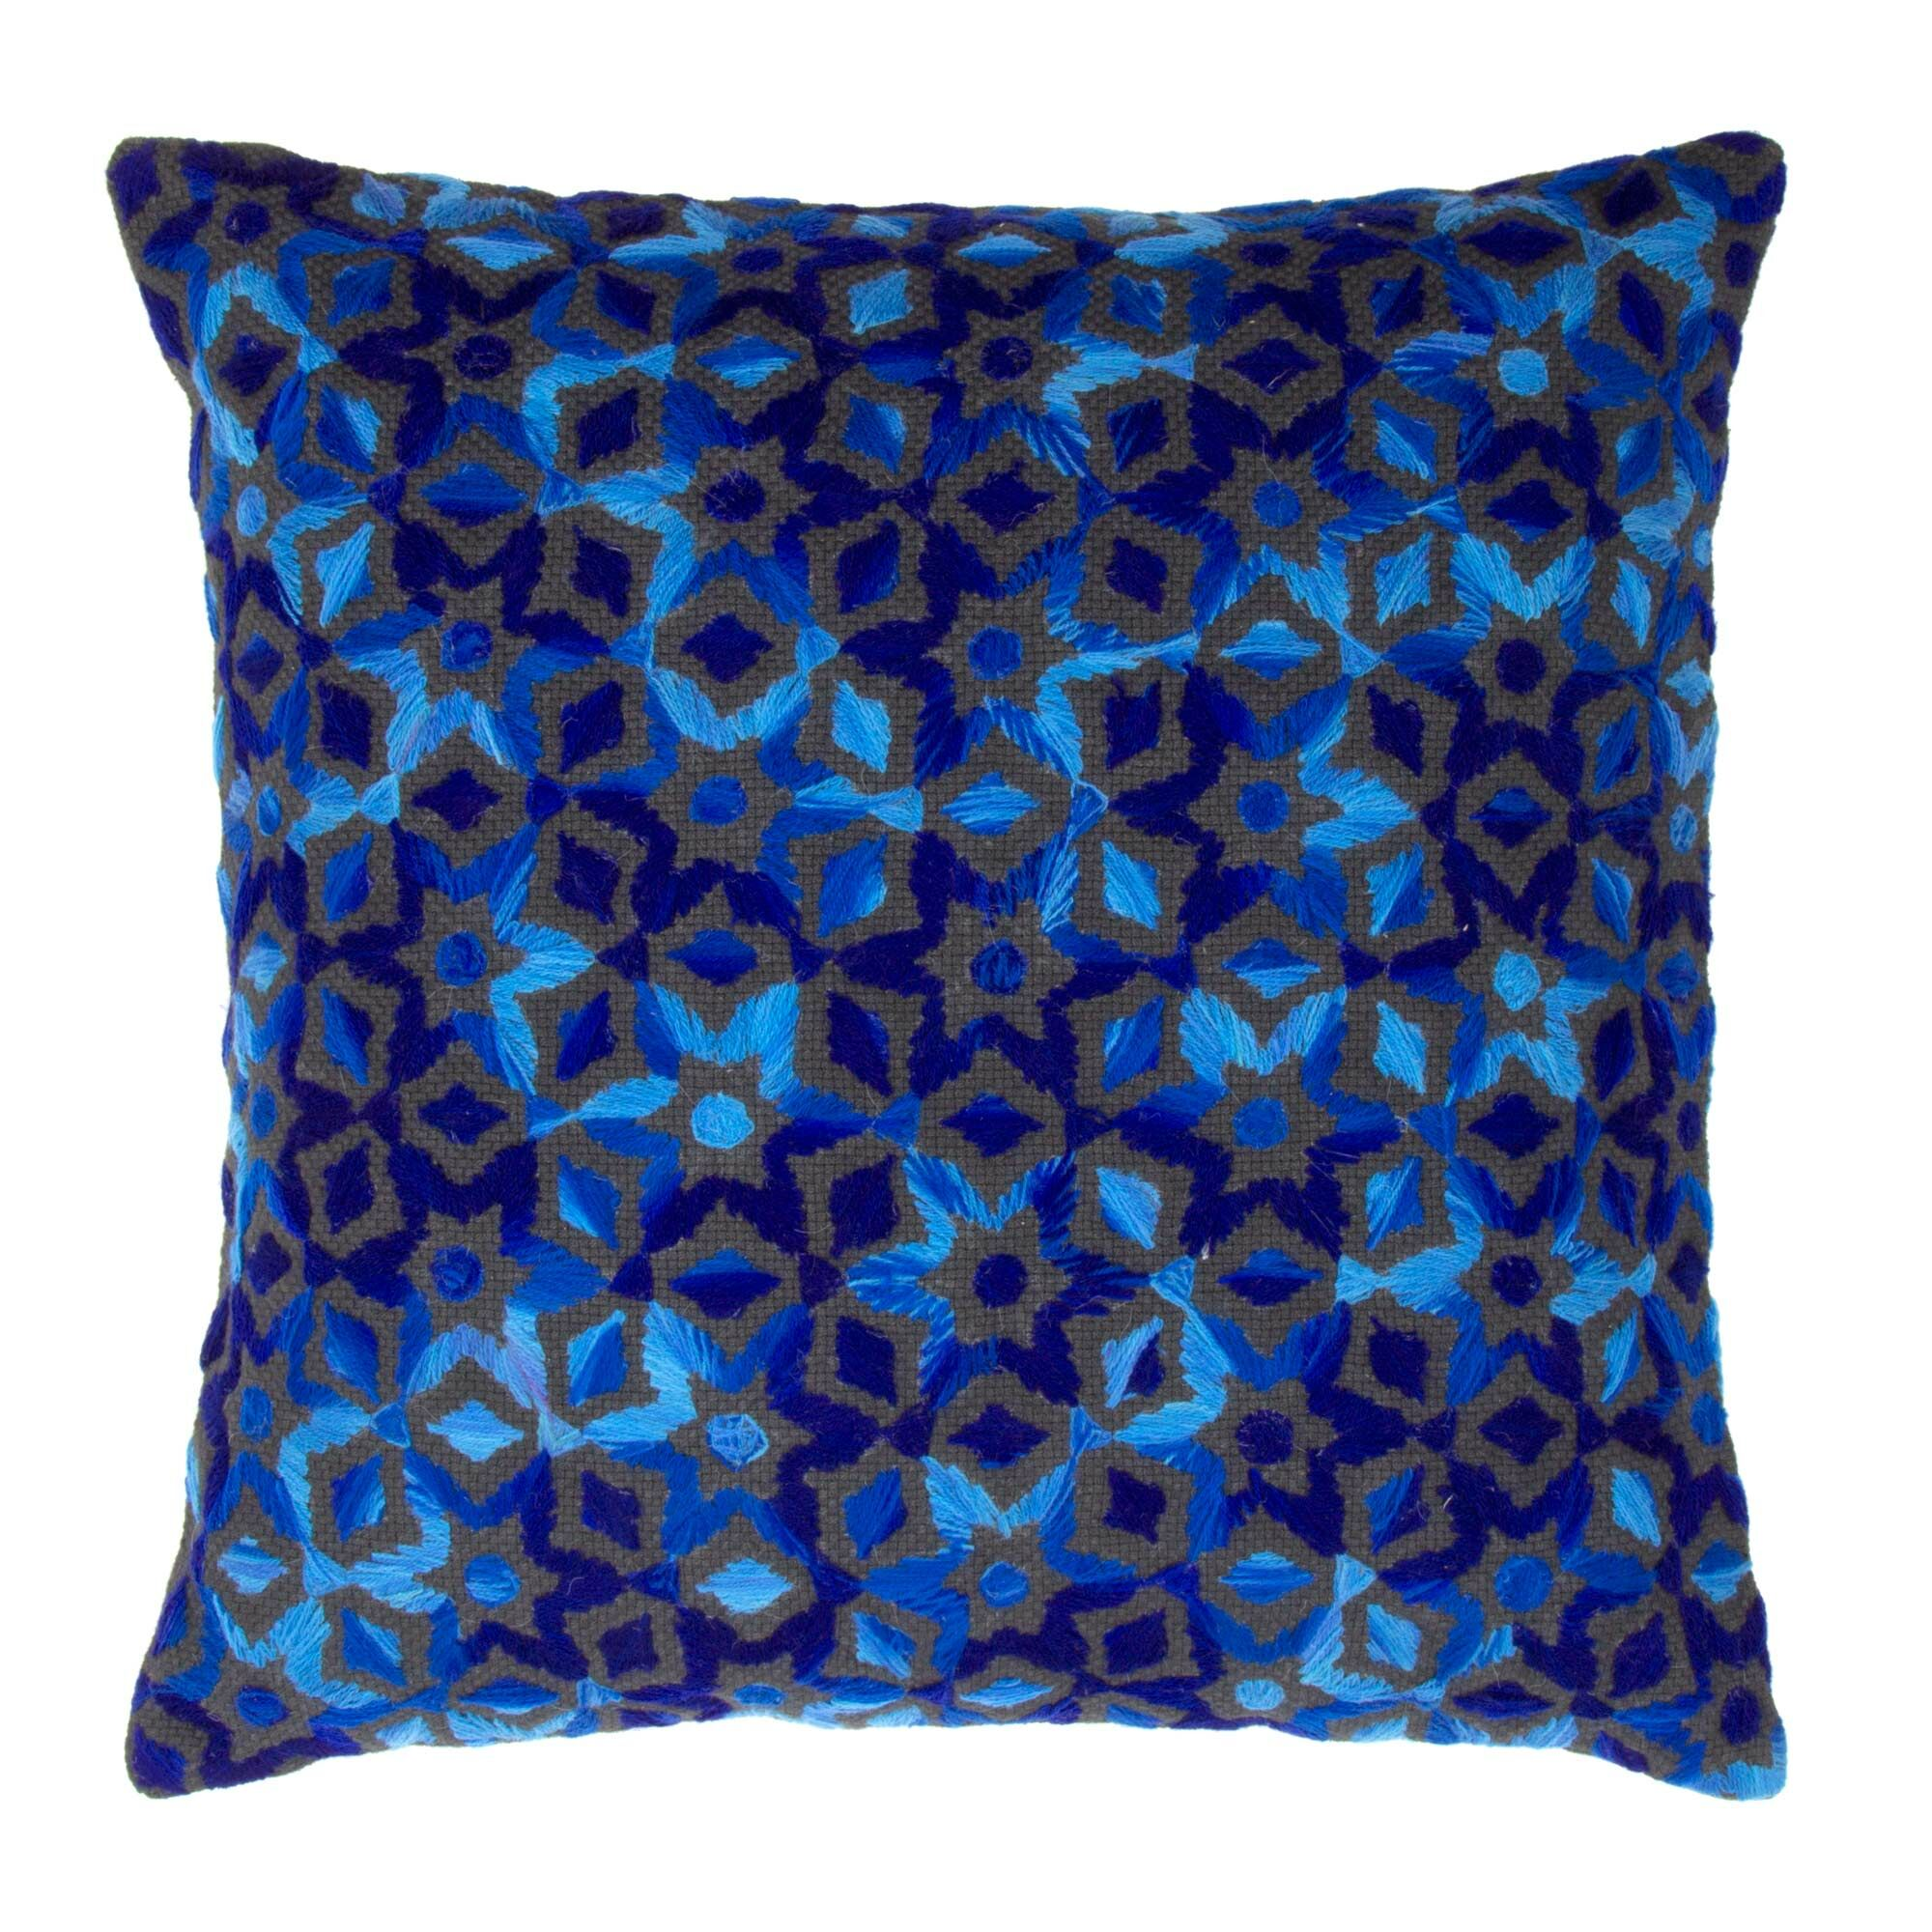 Essaouira Cotton Pillow Cover